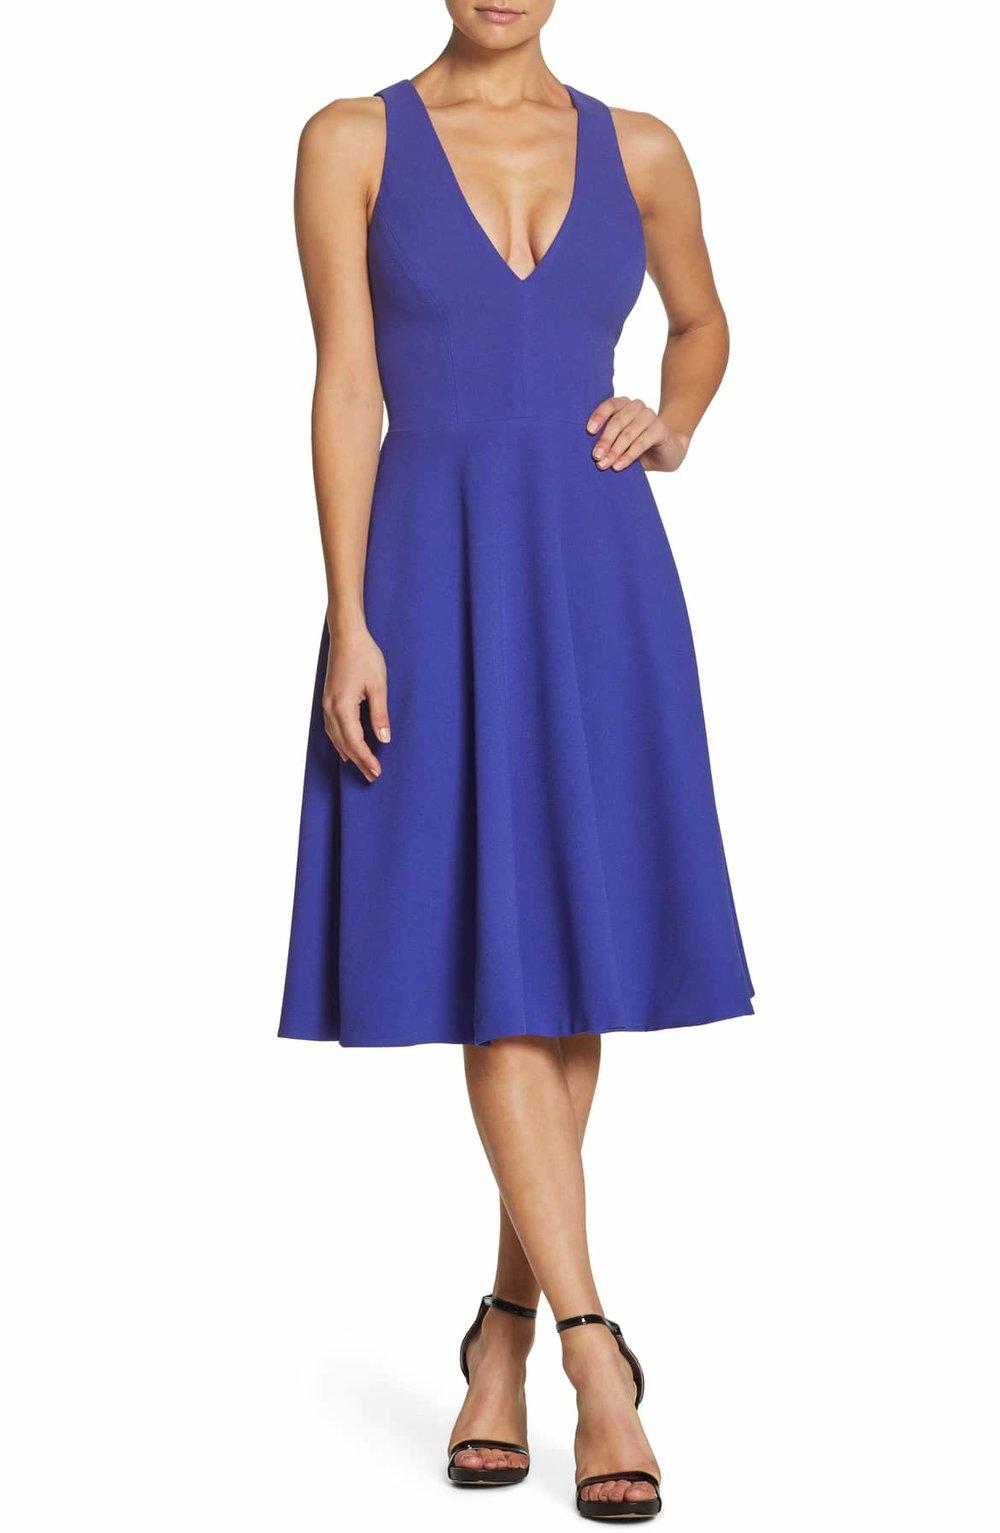 Dress The Population Catalina Tea Length Fit & Flare Dress - $182.00